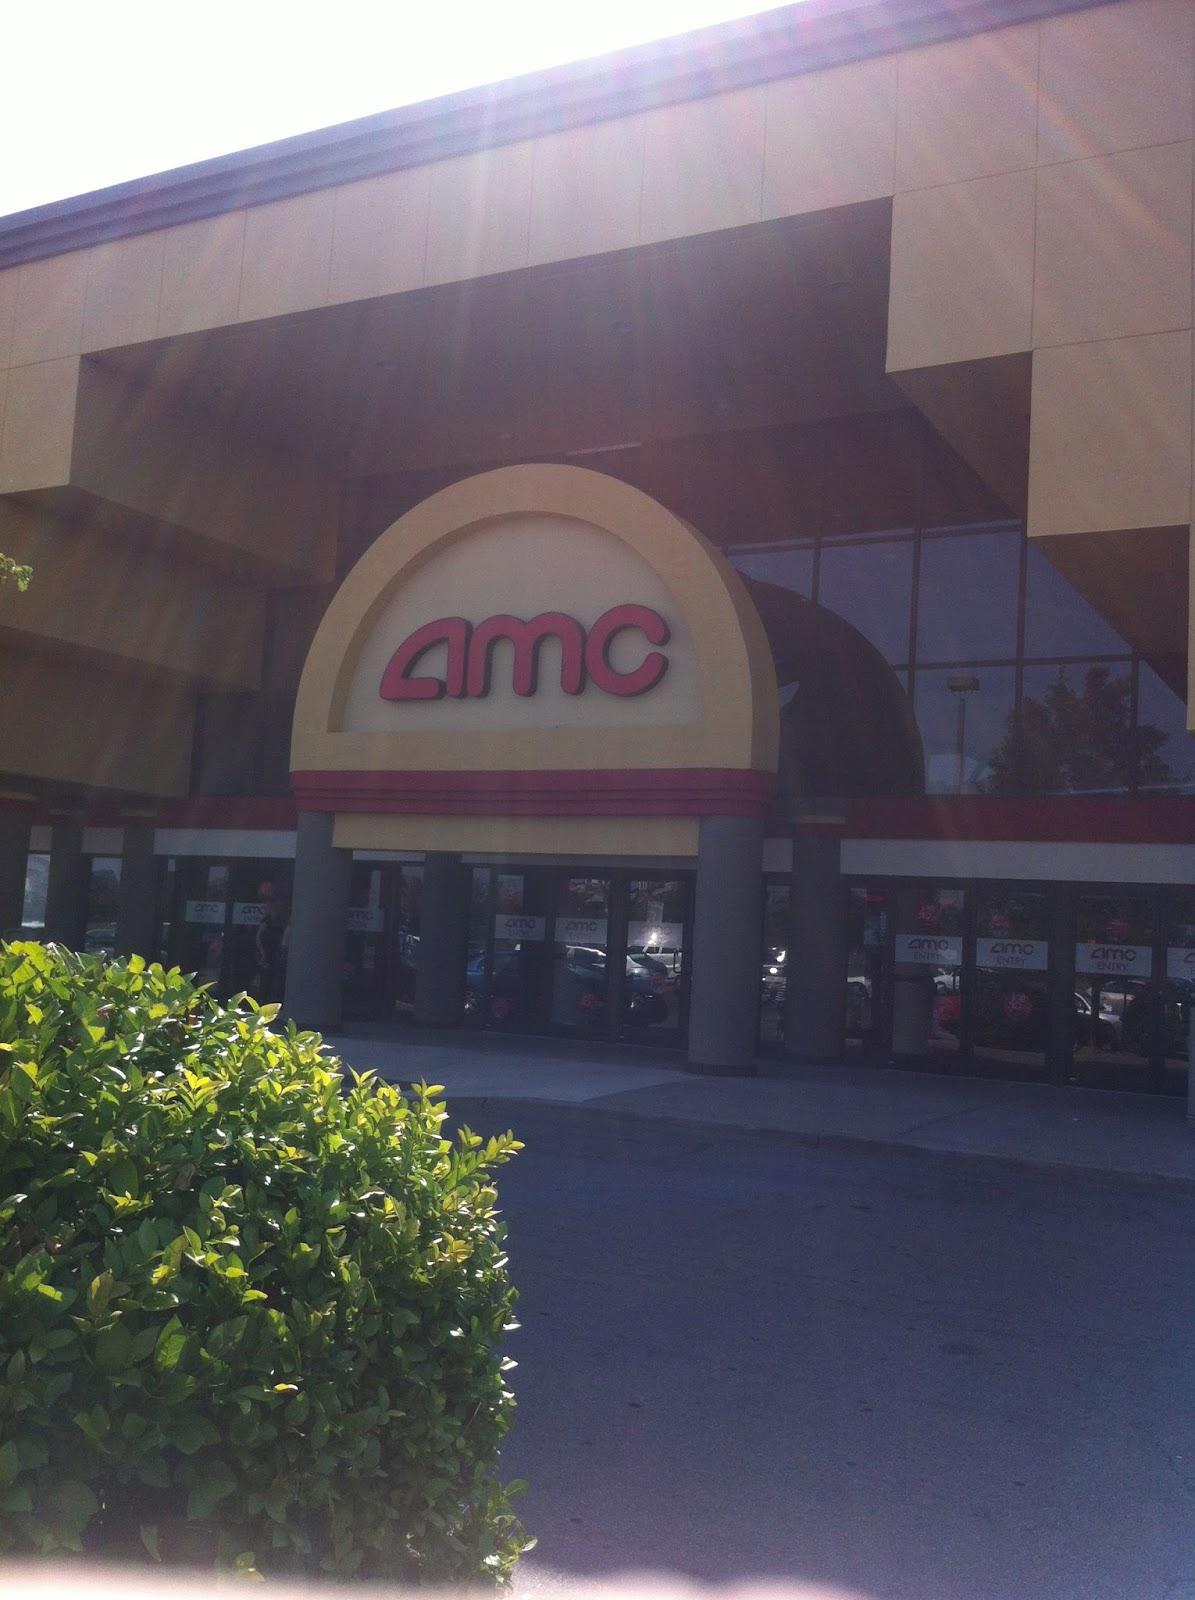 Local cinemas